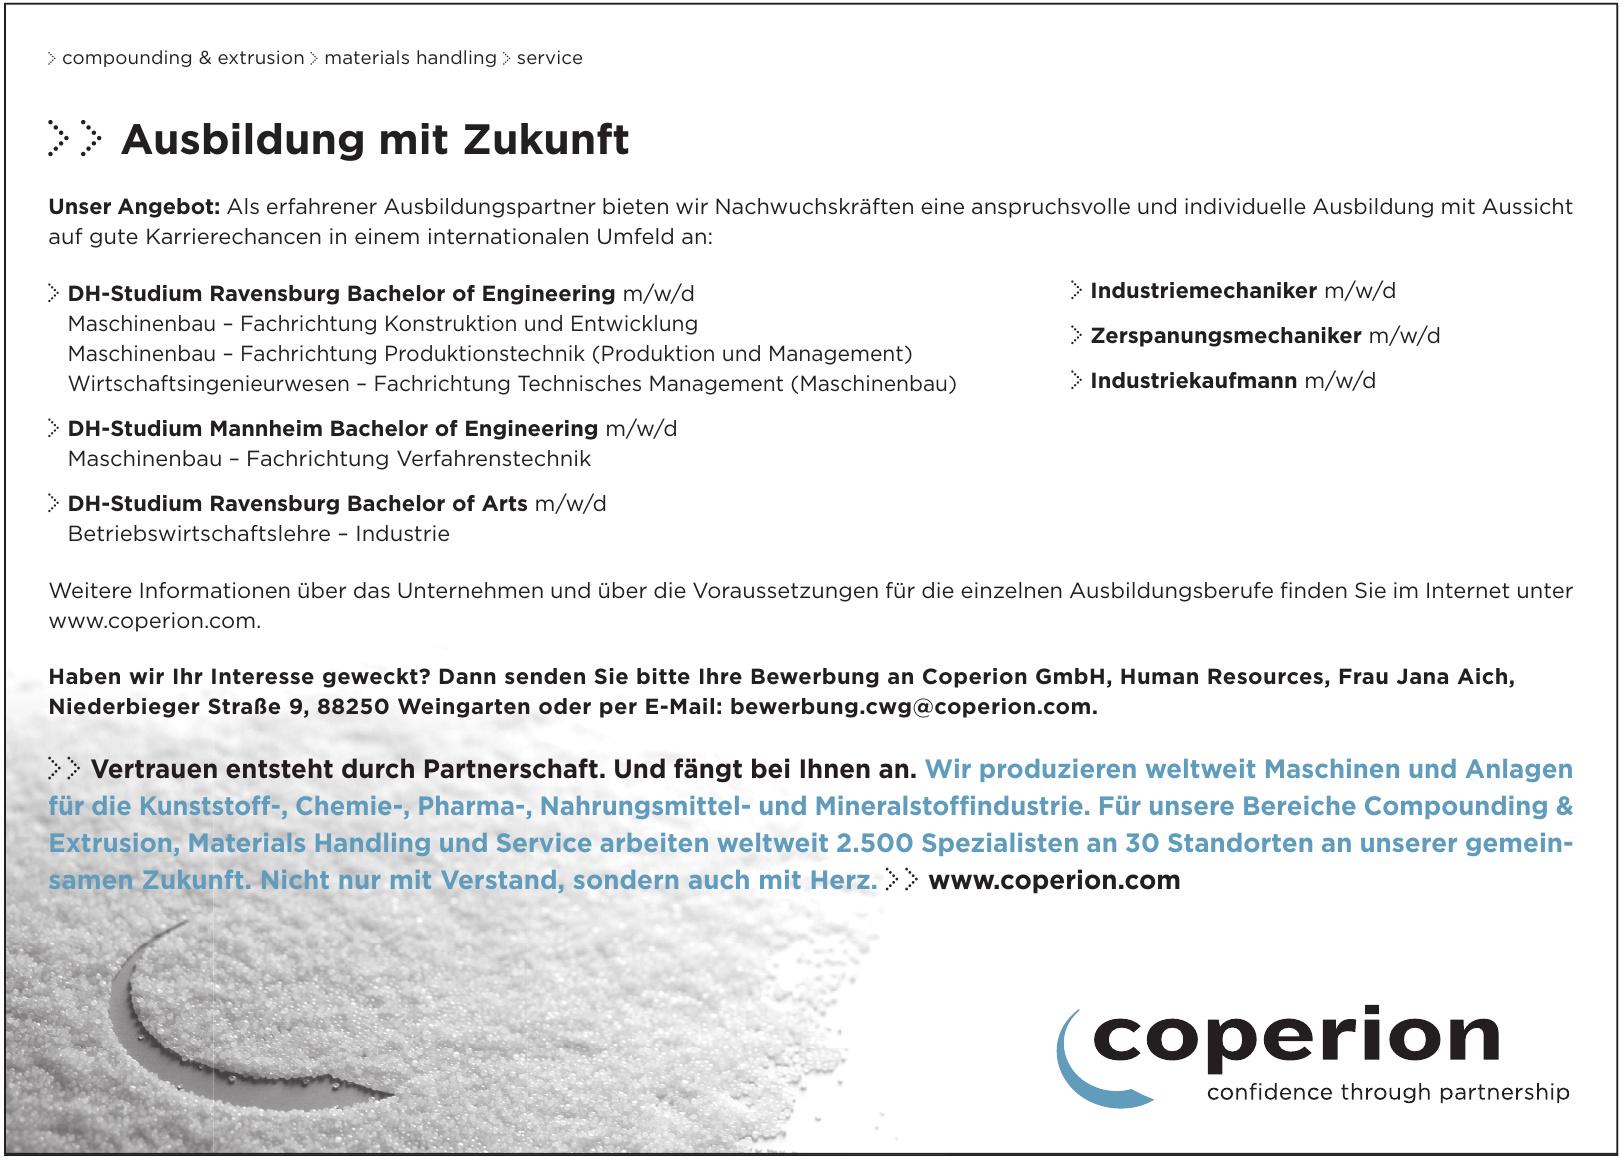 Coperion GmbH